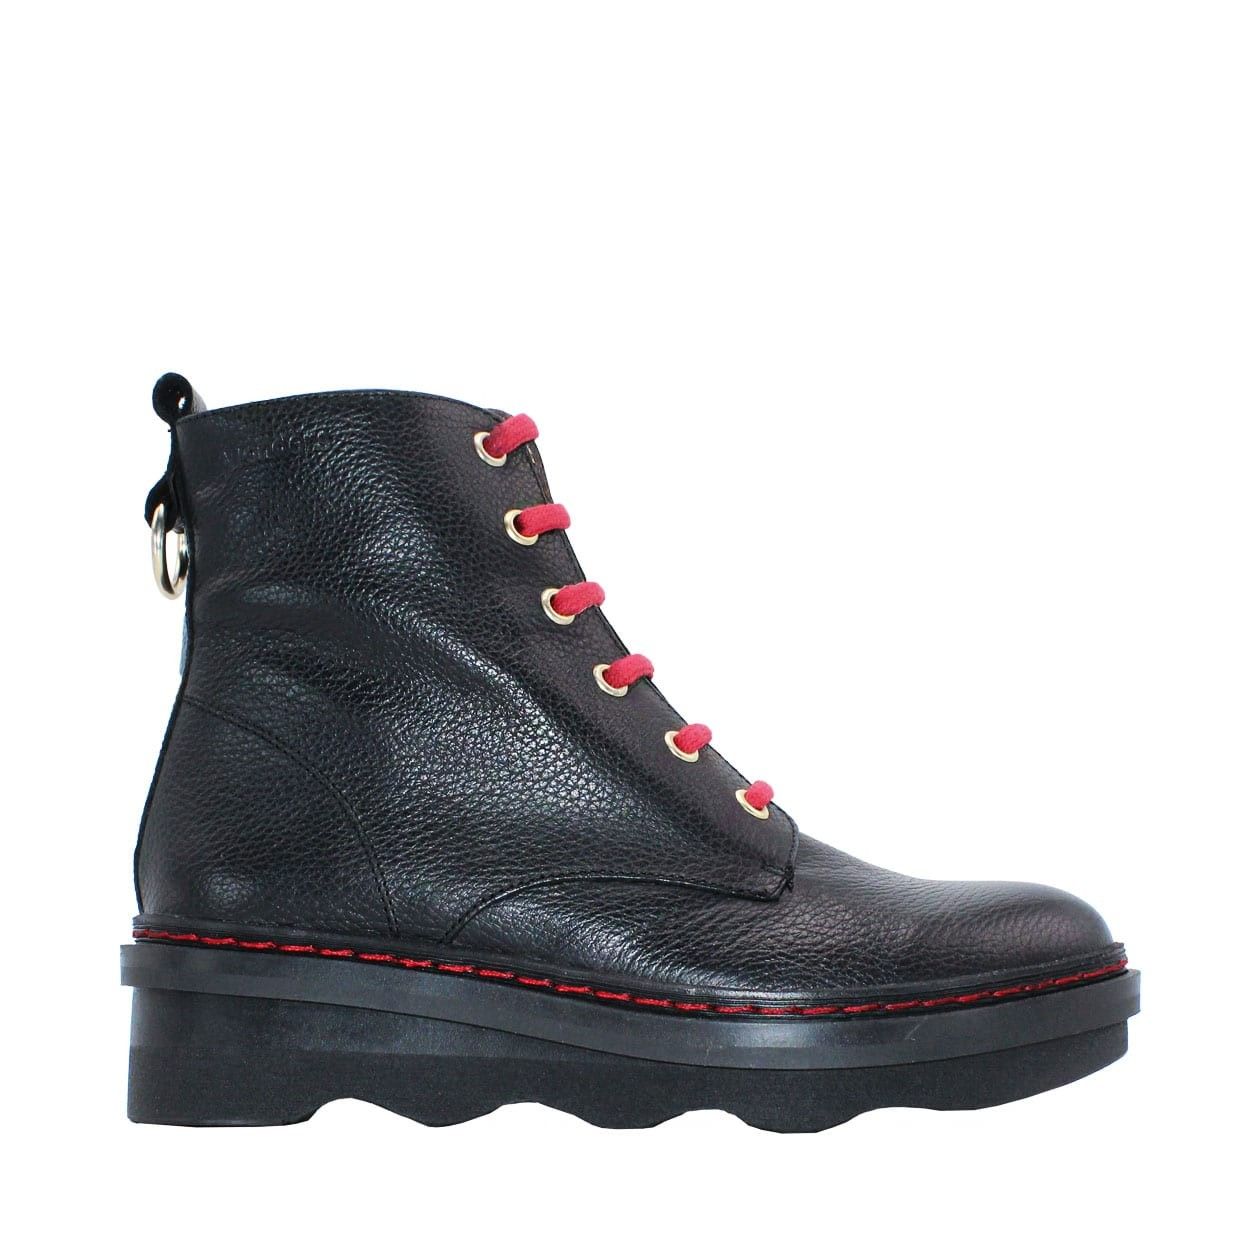 b56166662bc WONDERS - ΜΠΟΤΑΚΙΑ - ΓΥΝΑΙΚΕΙΑ   Papanikolaou Shoes